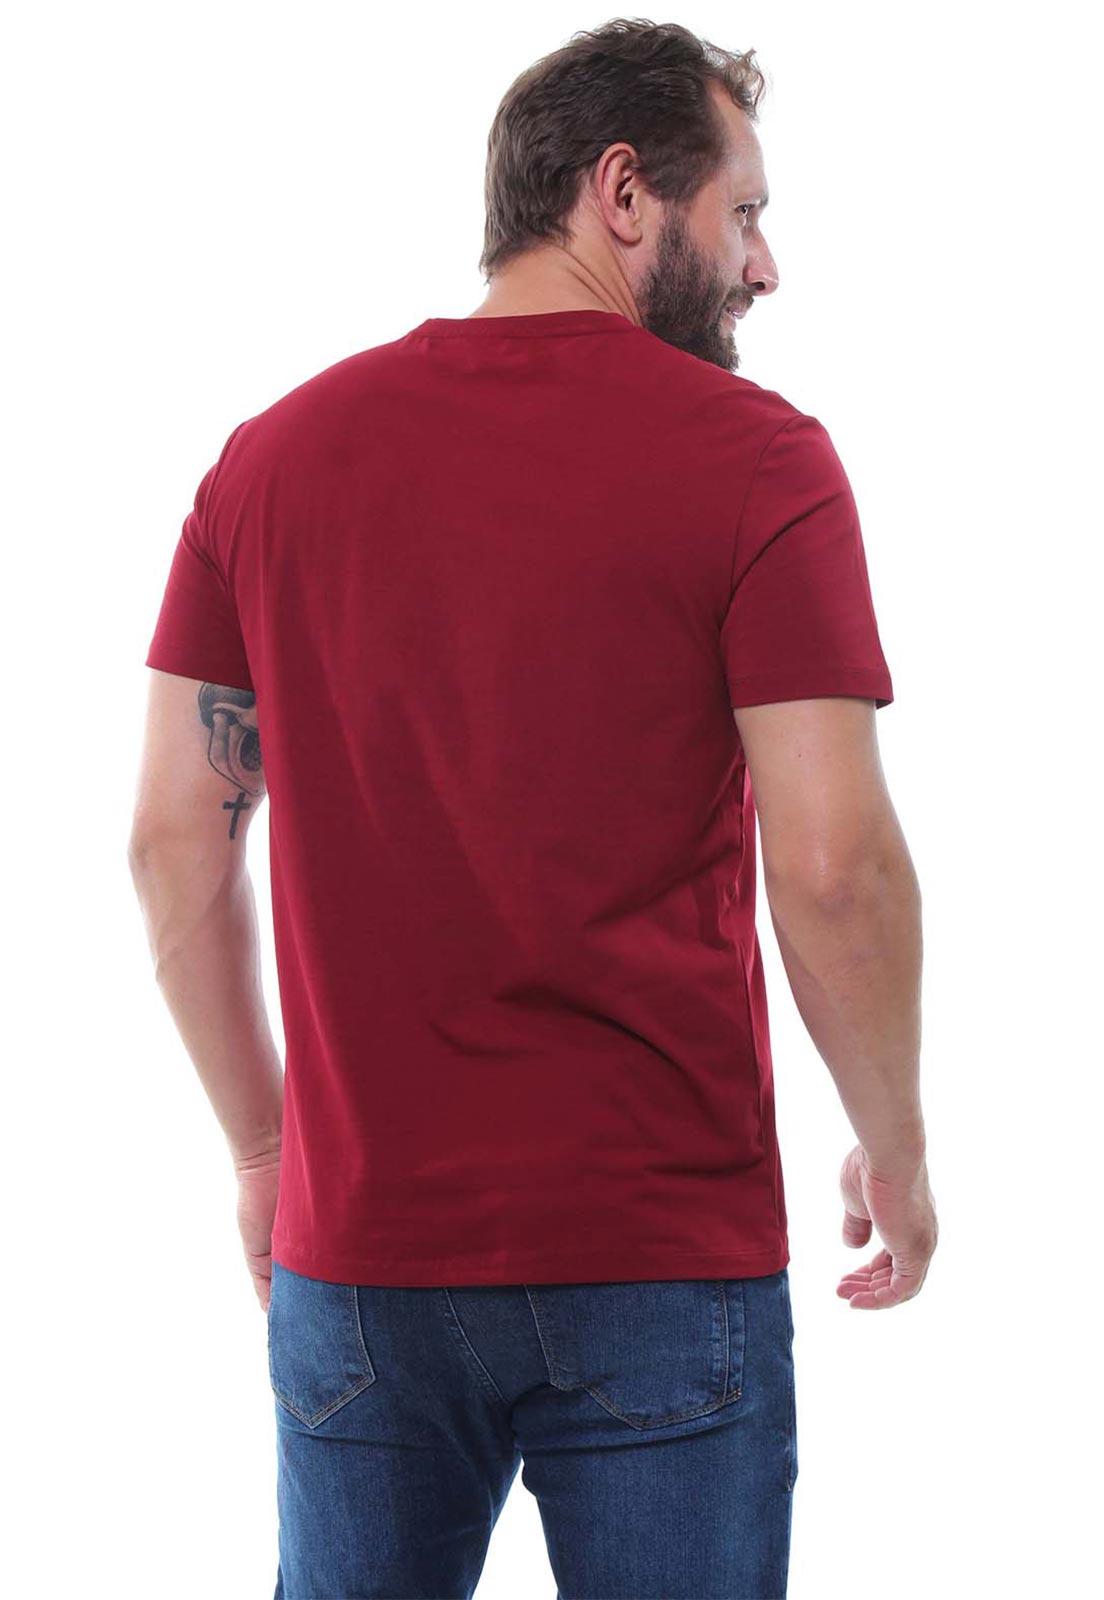 Camiseta Masculina Crocker - 47850  - CROCKER JEANS